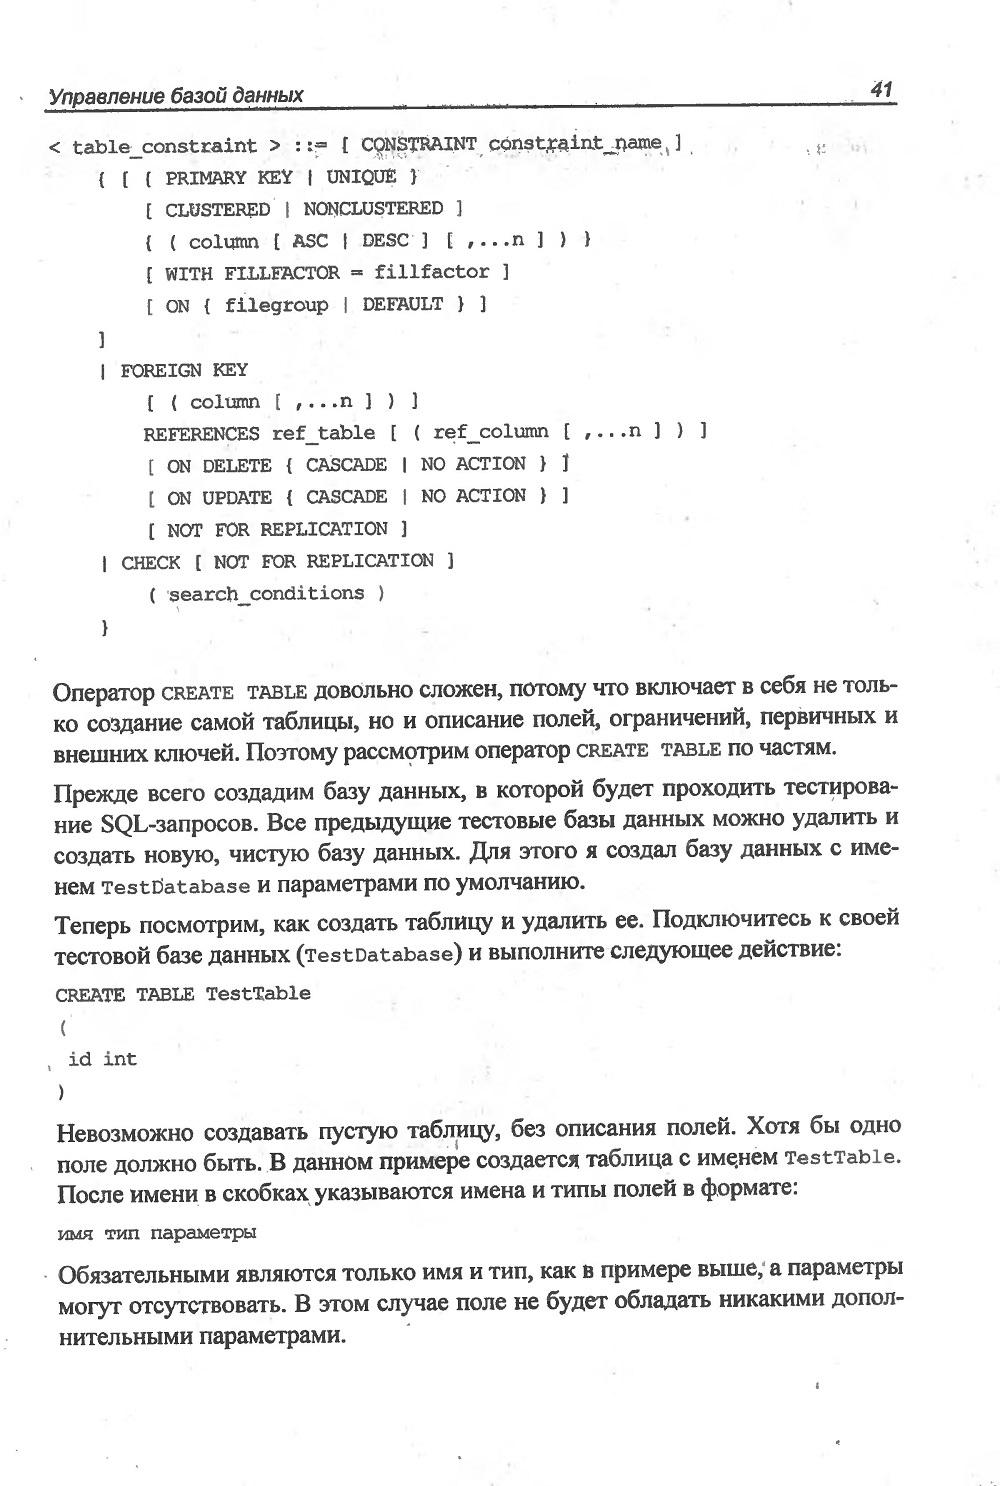 http://i5.imageban.ru/out/2014/01/20/794b3e54236d33345a23d03abe834ff6.jpg